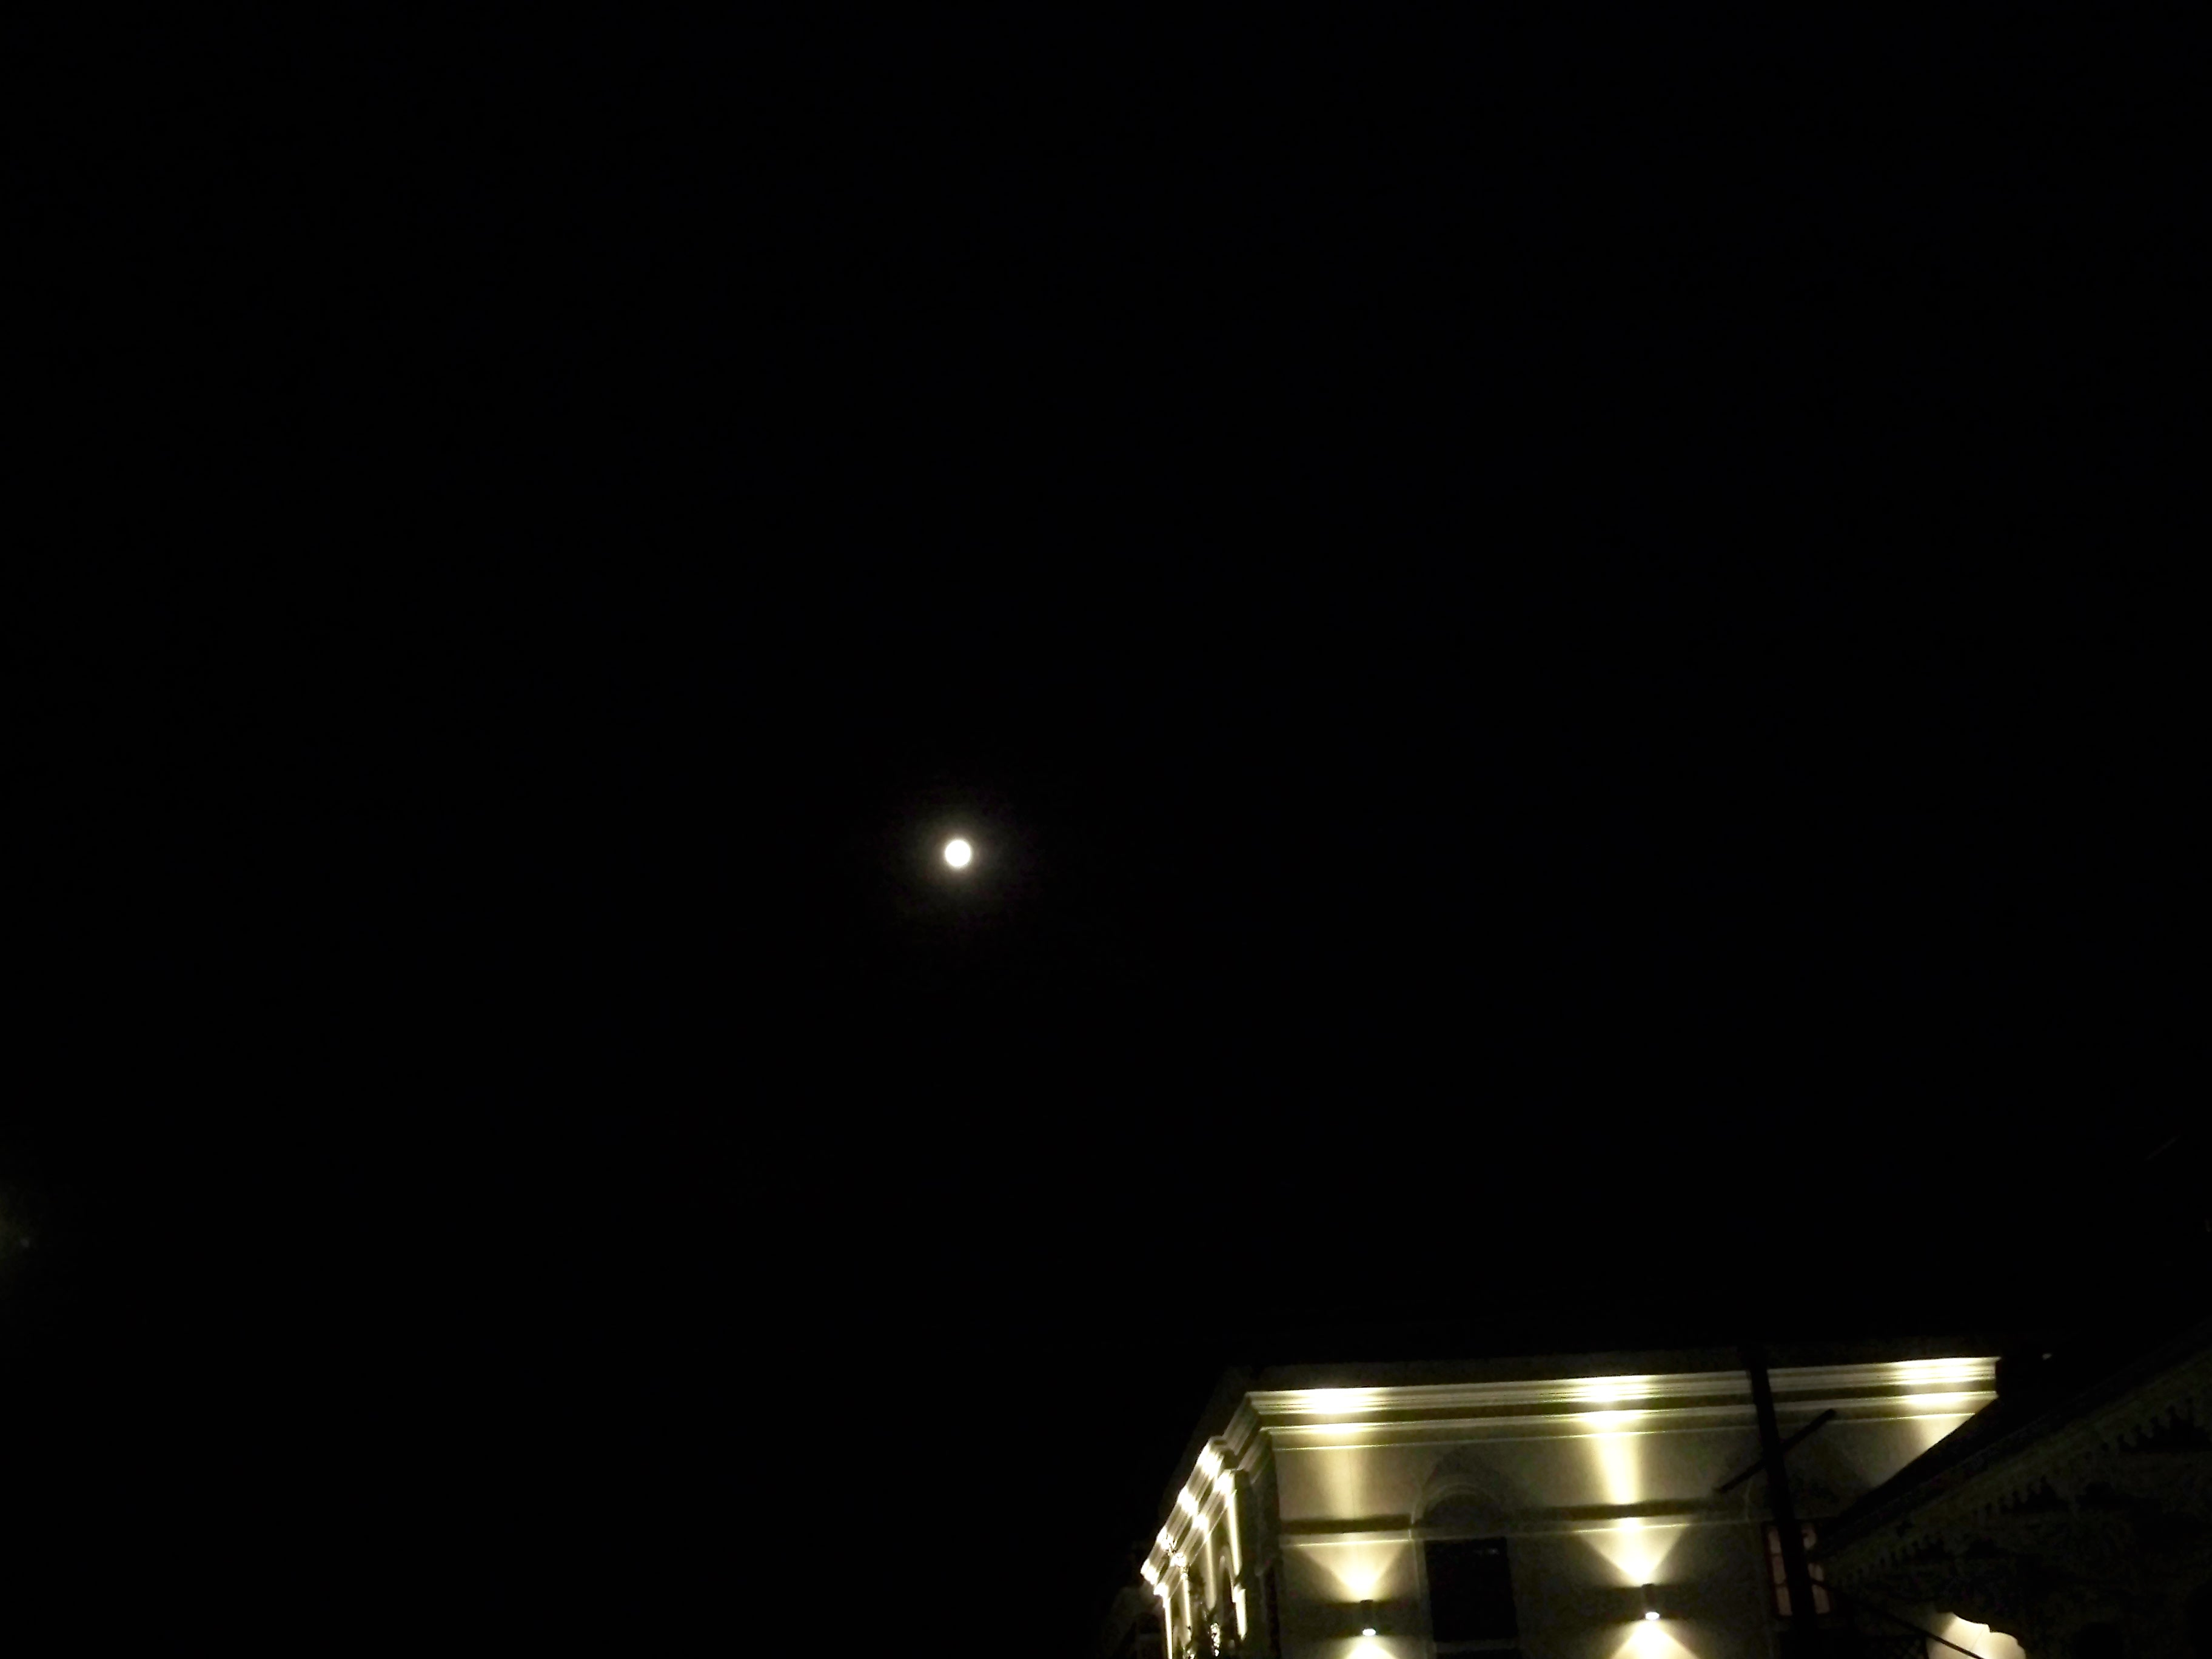 Moon at Euterpe and St. Charles